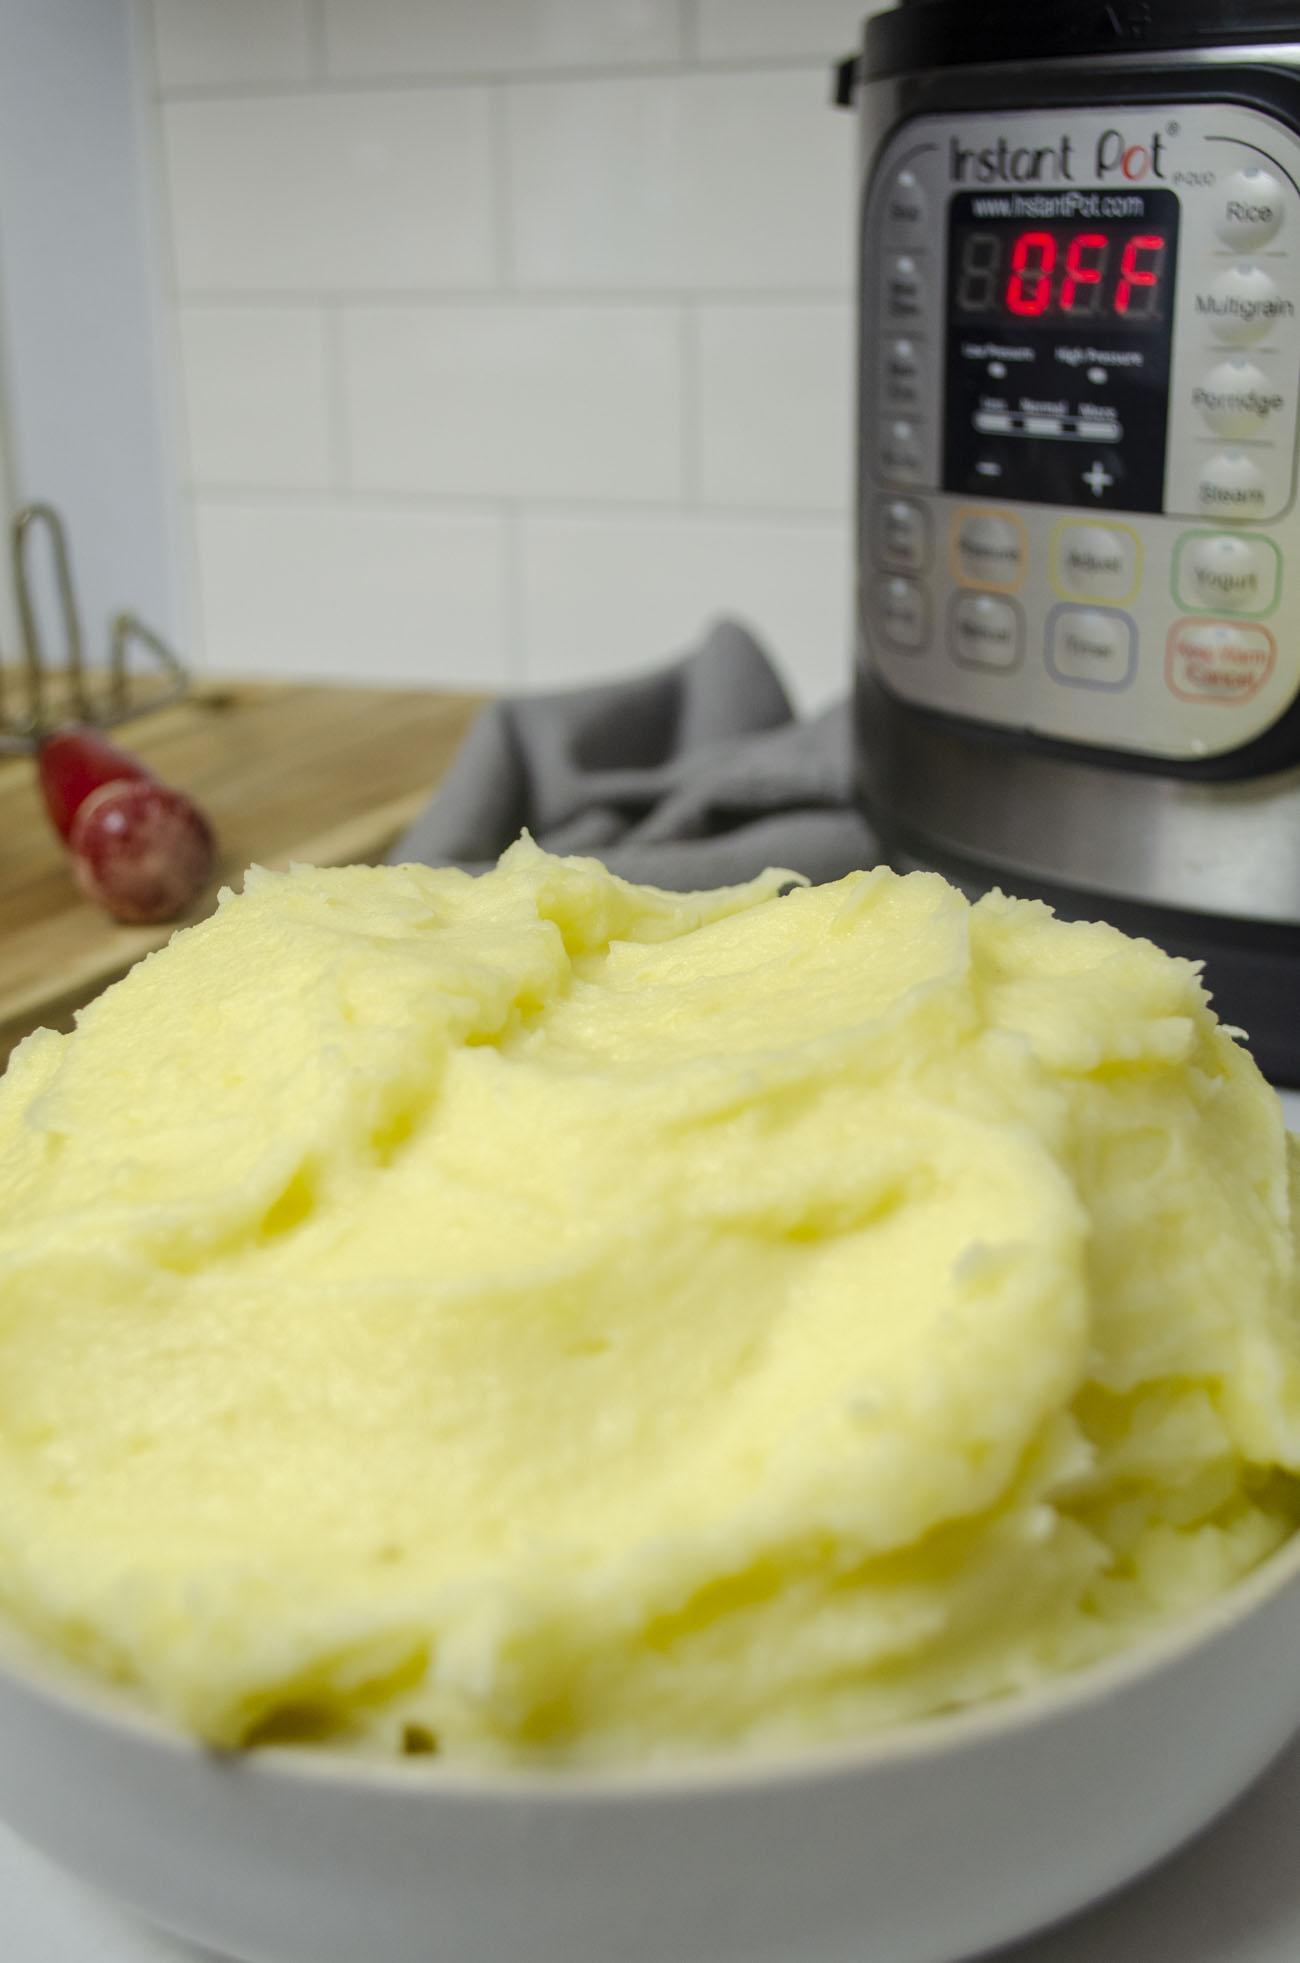 Instant Pot Mashed Potatoes Vertical 07